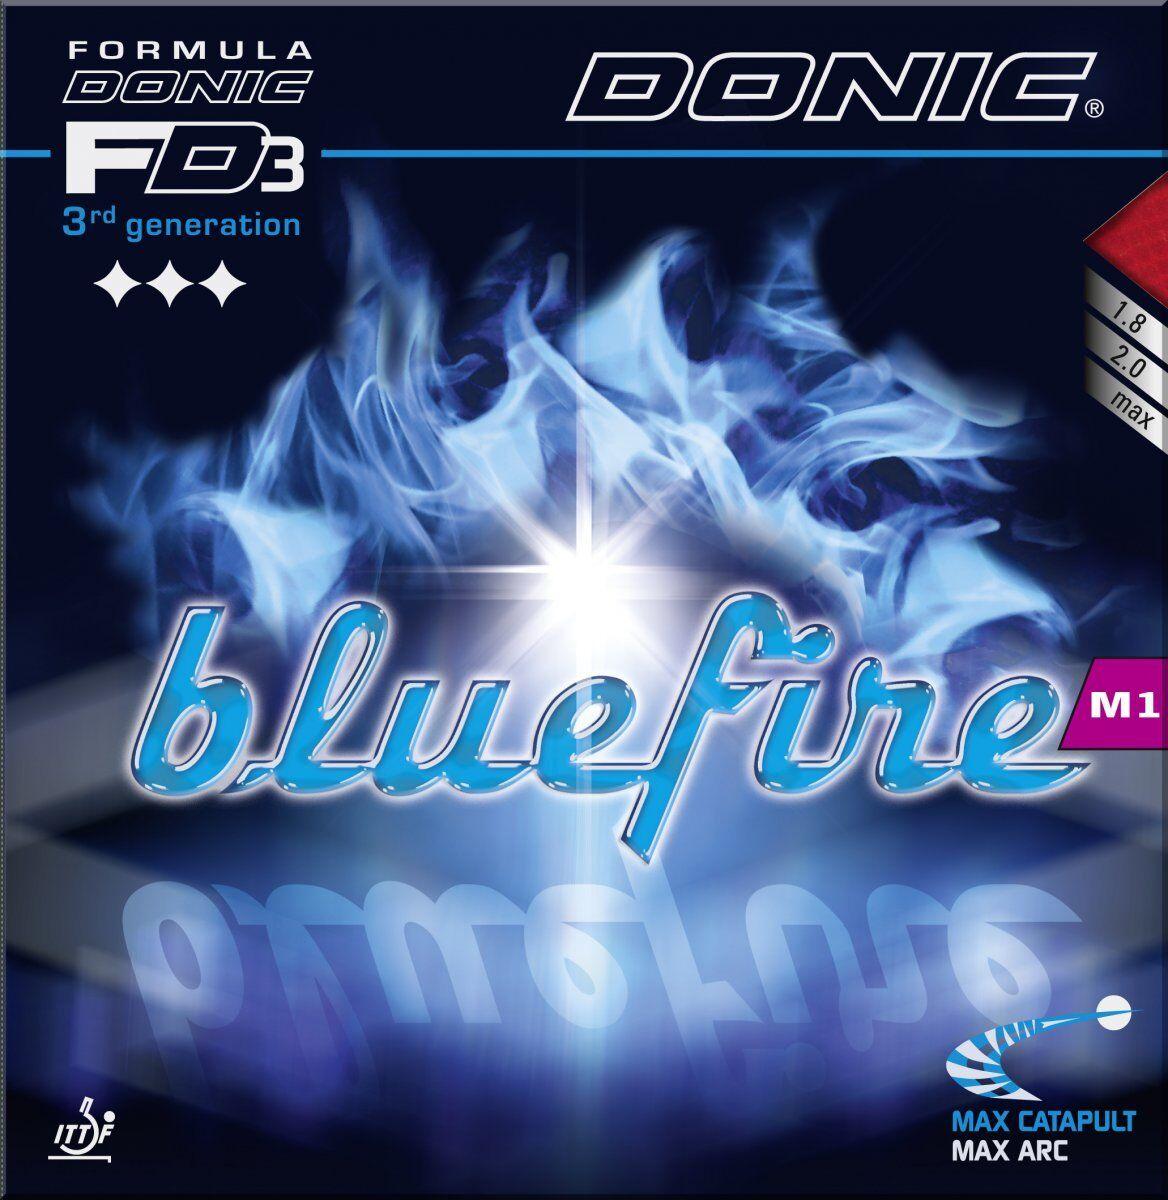 Donic Blaufire M1 M2 M3 1 8 8 8 2 0 Max mm    Schw Rot 9d3230